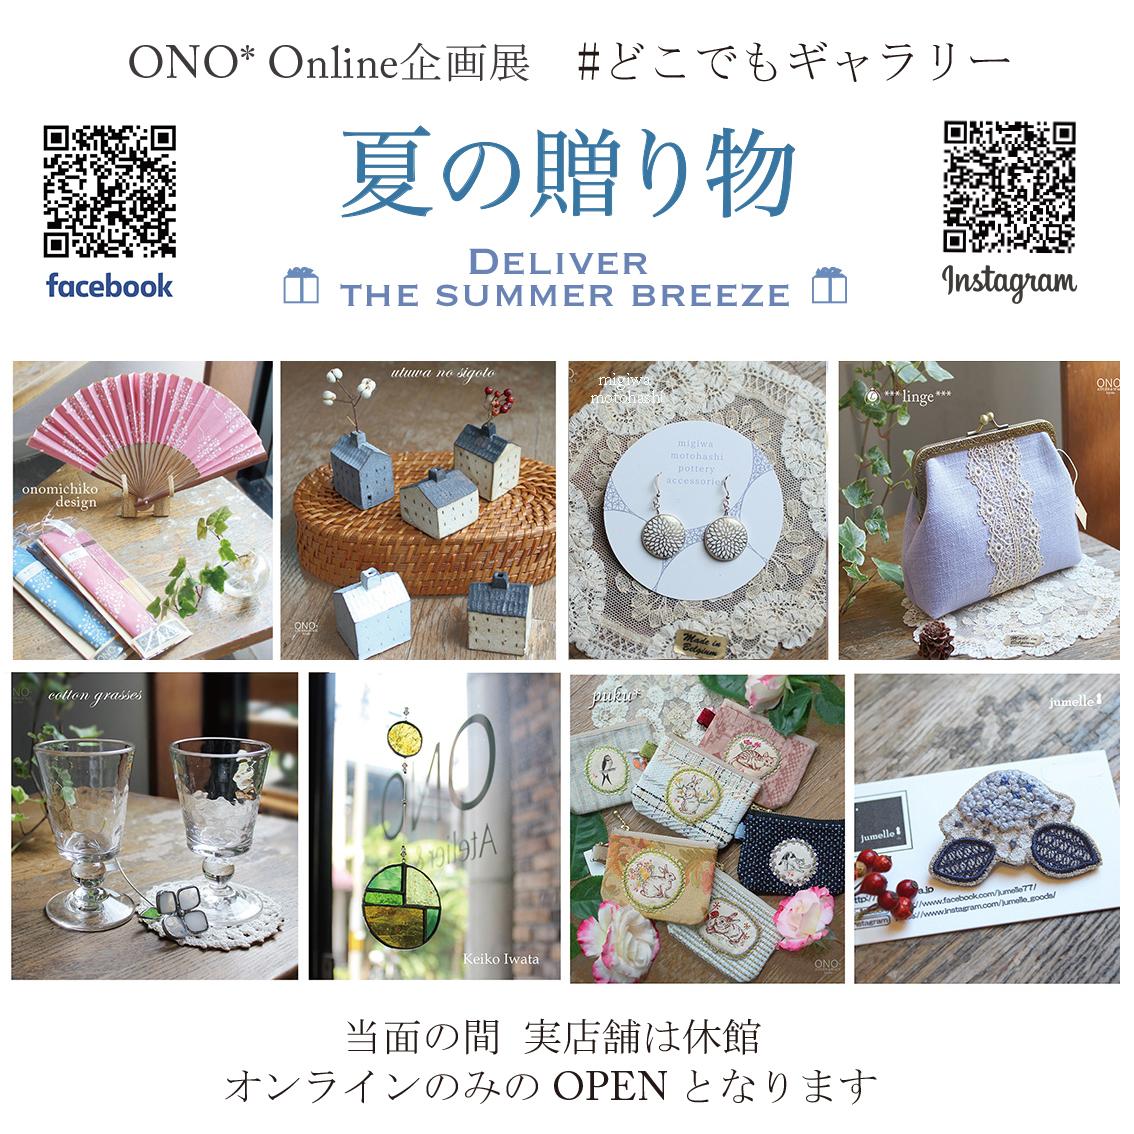 Online常設展『夏の贈り物 〜Deliver the summer breeze〜』開催中☆